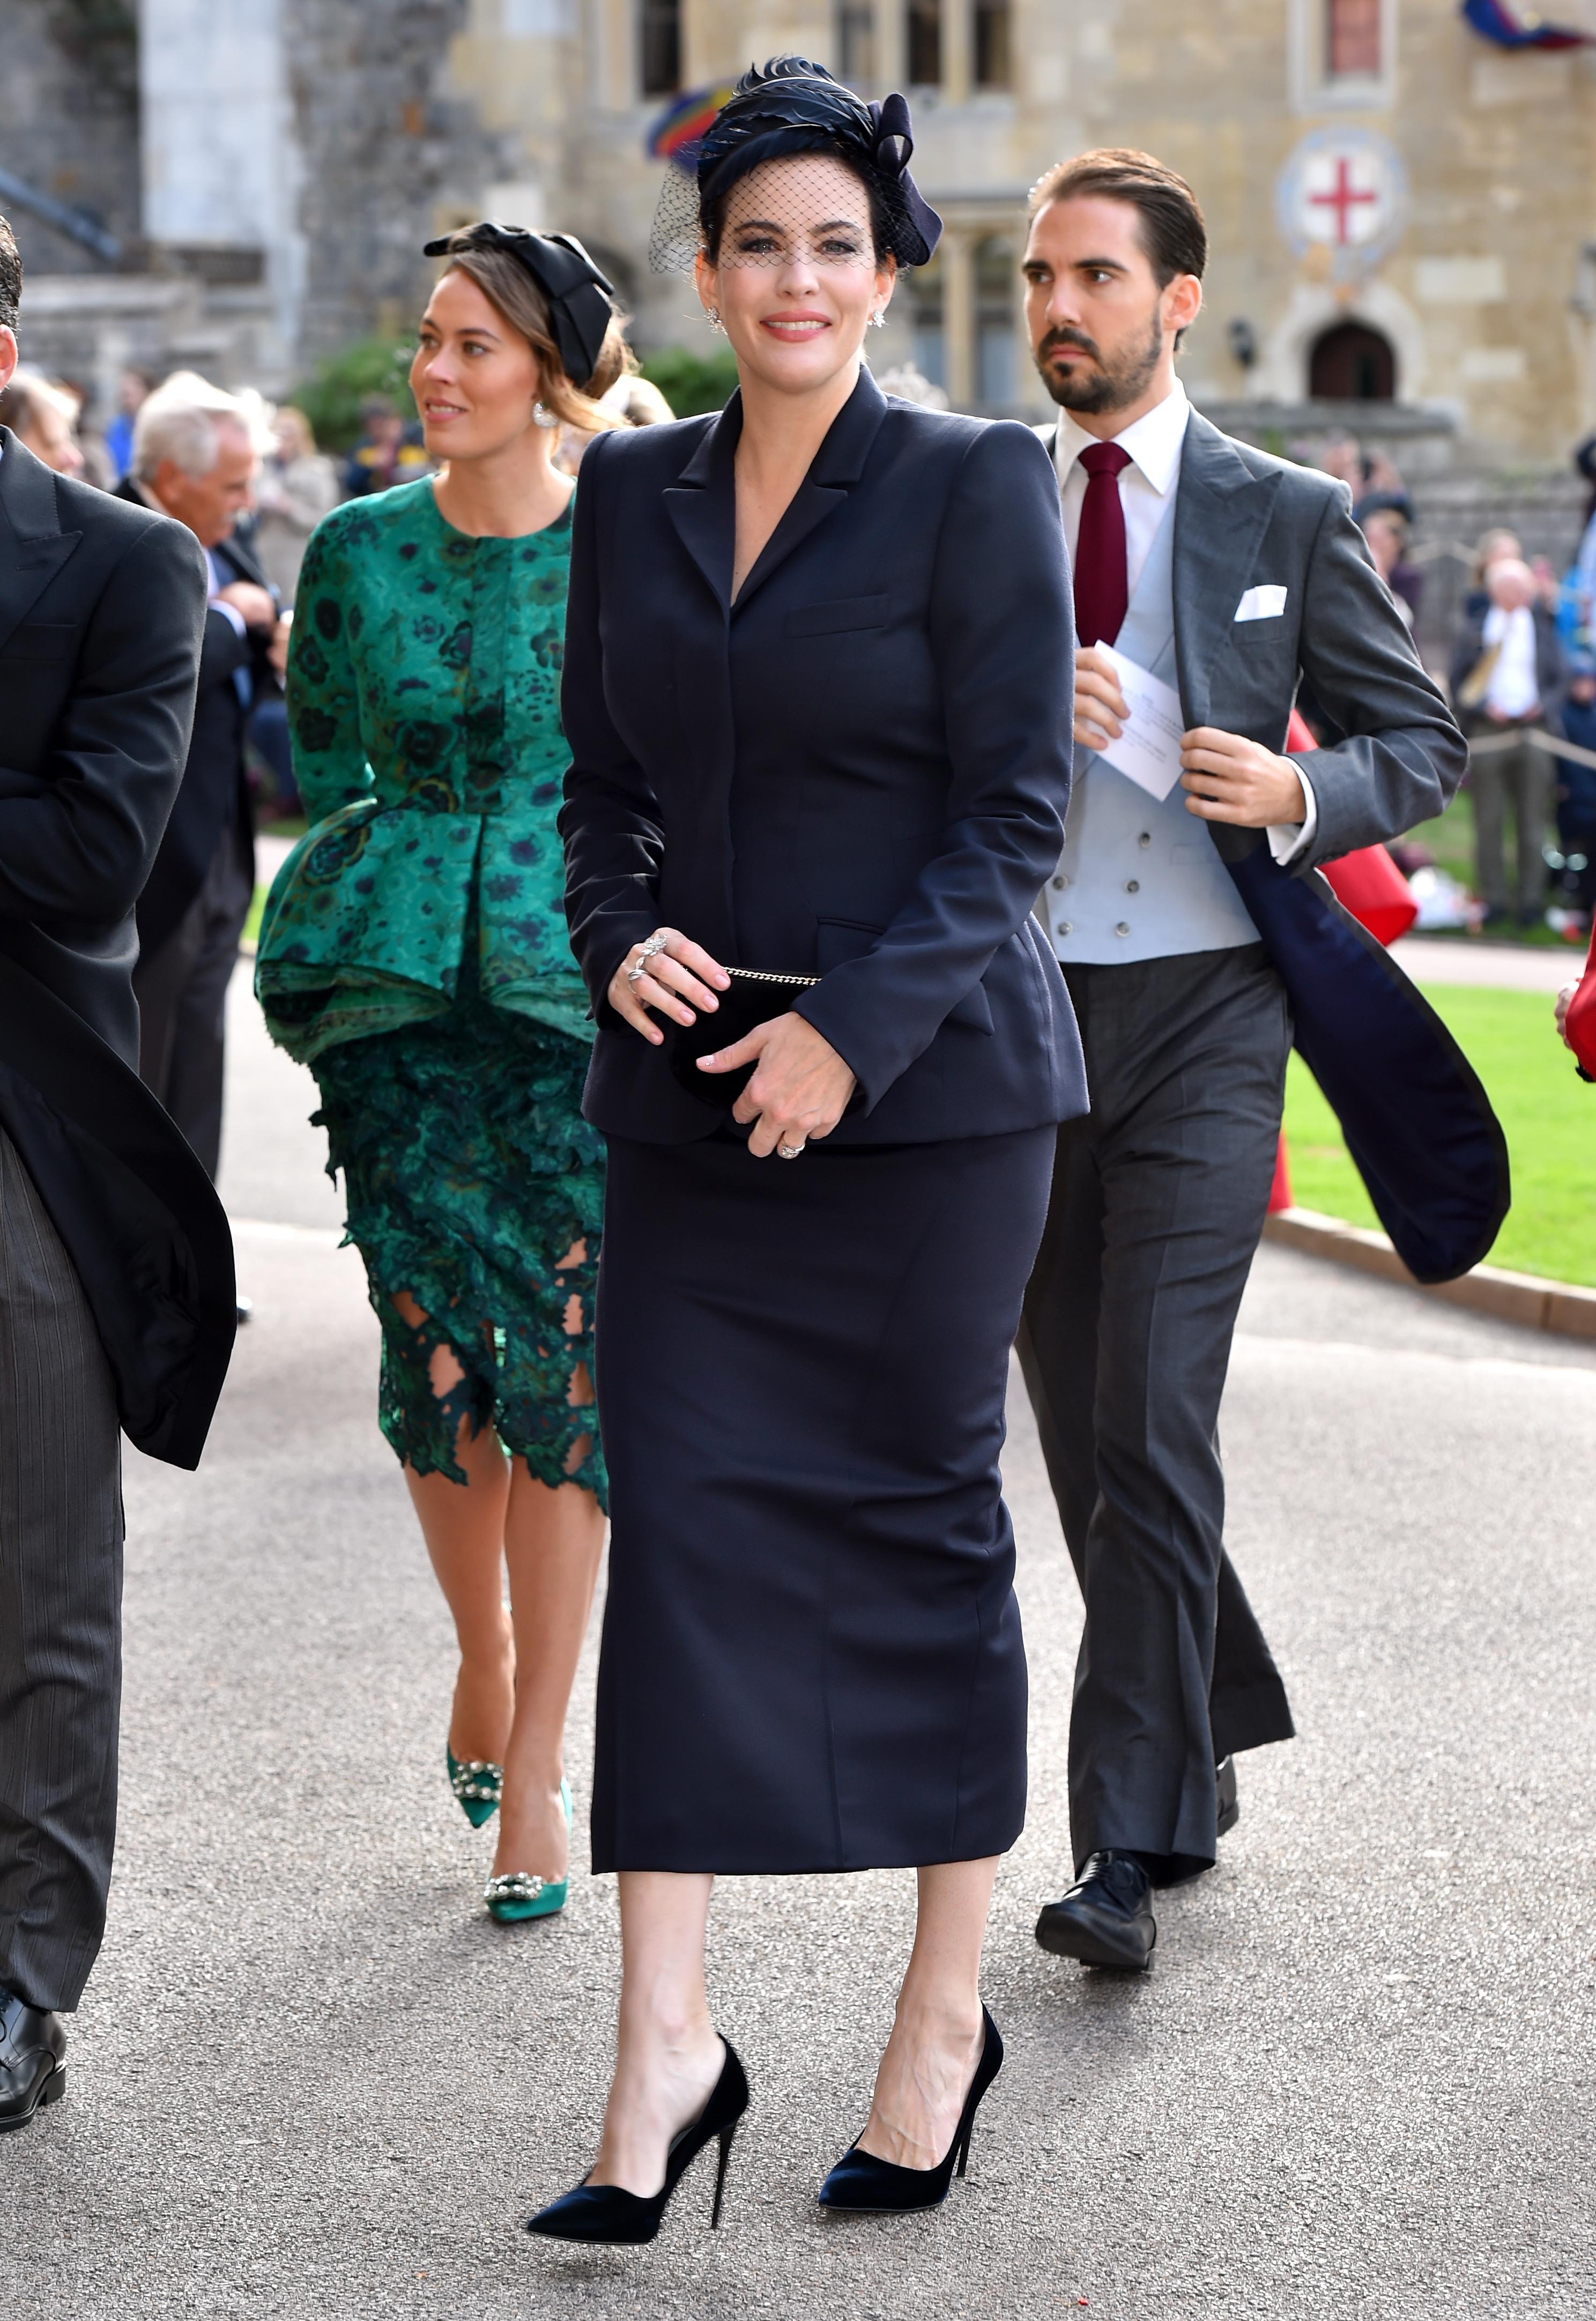 Royal wedding Jack latest  Princess Eugenie and Jack wedding Brooksbank are ... 2e5fd9